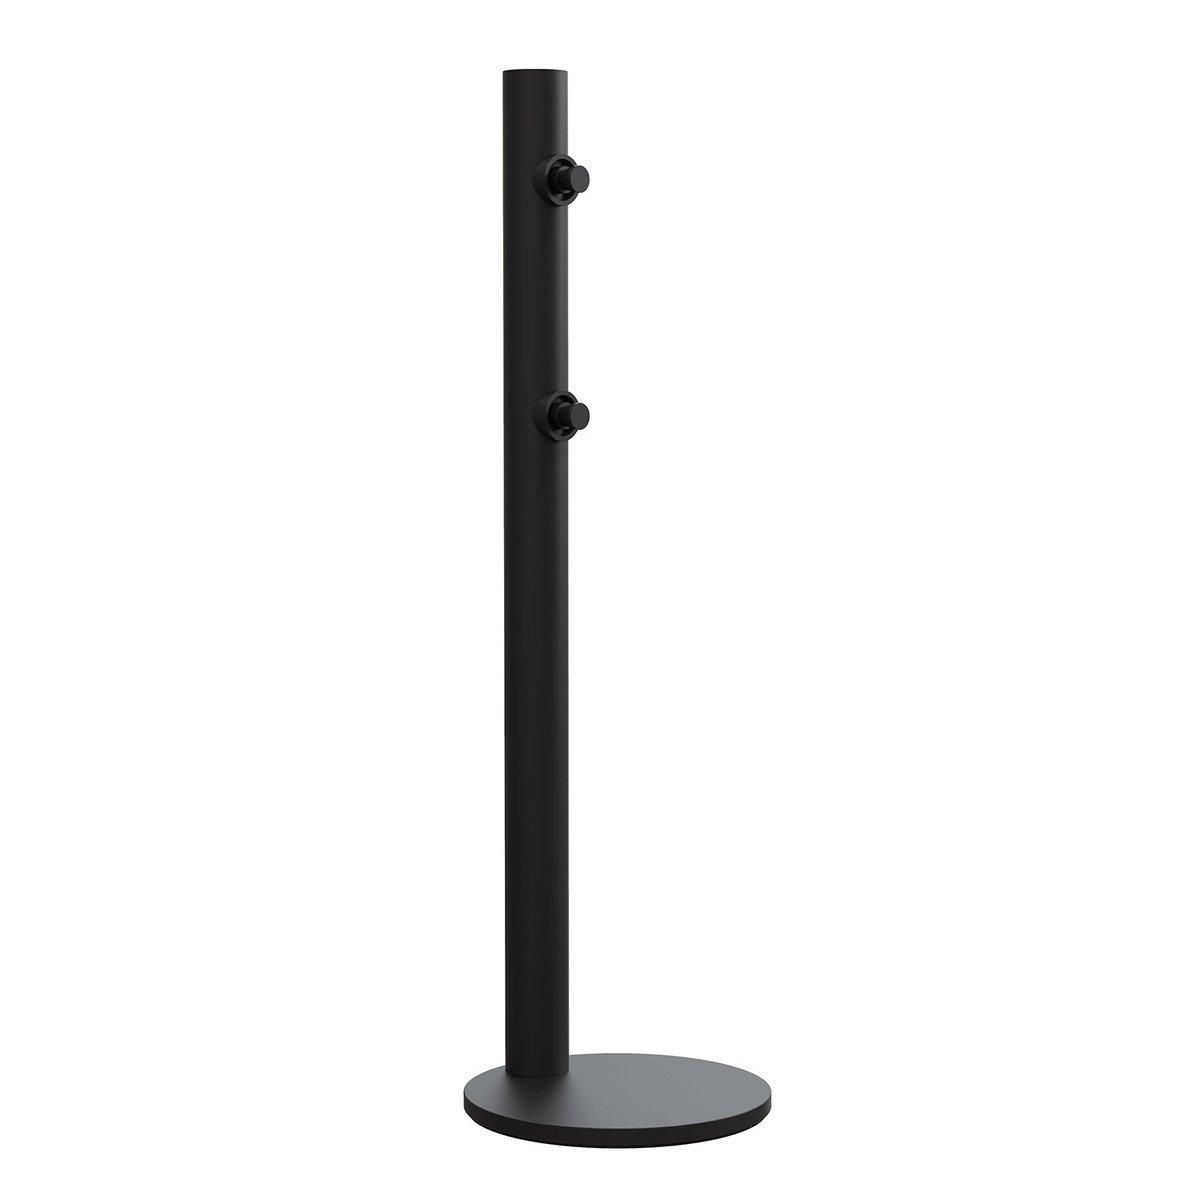 Frost Nova2 Table Dispenser Stand, Matt Black